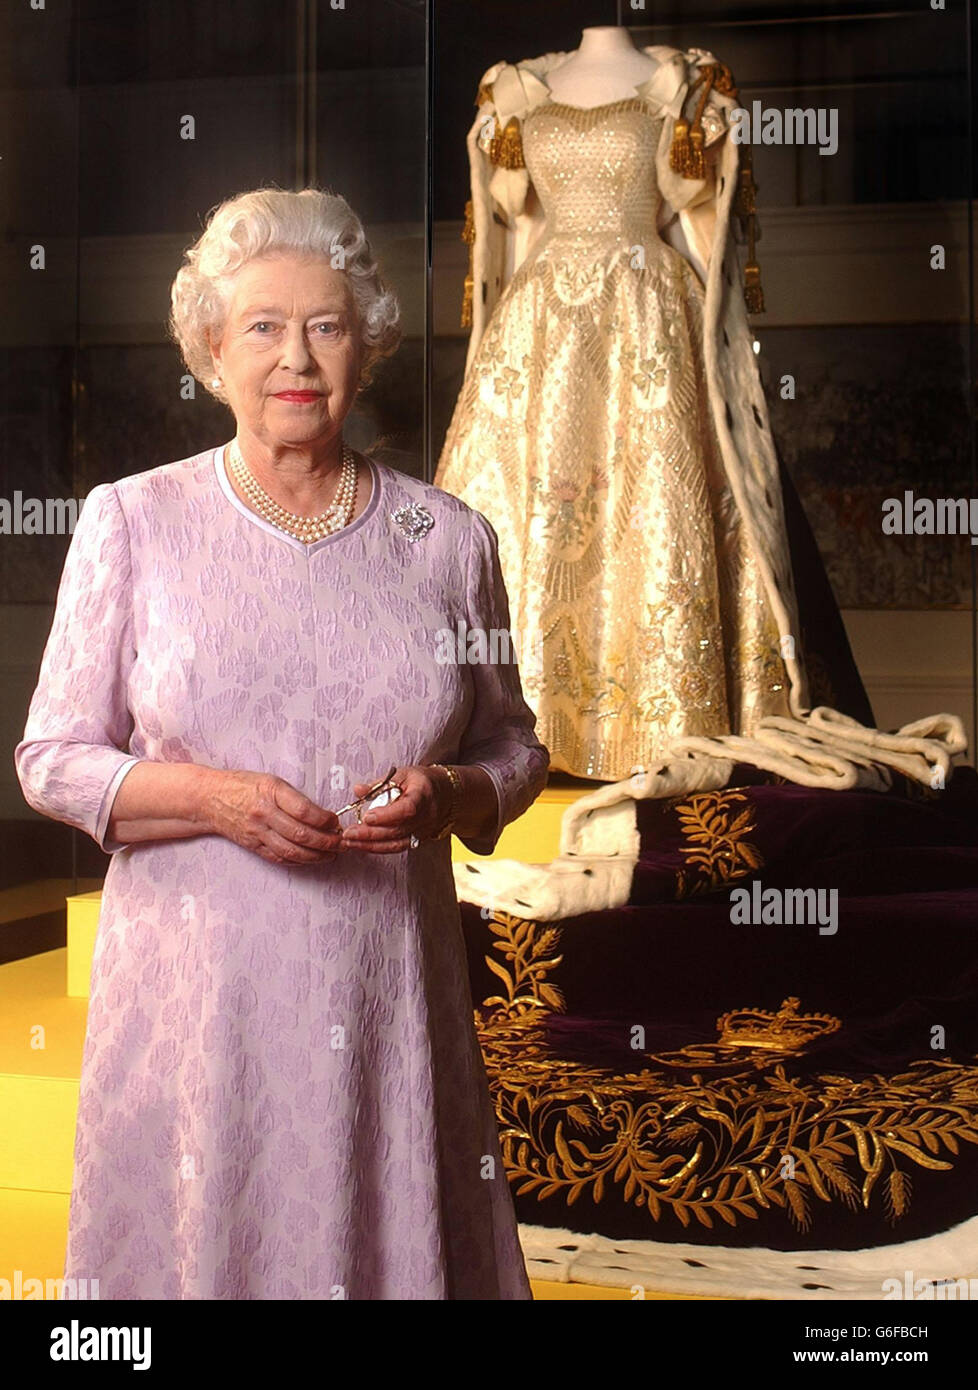 Queen Elizabeth - Coronation dress Stock Photo: 107288401 - Alamy